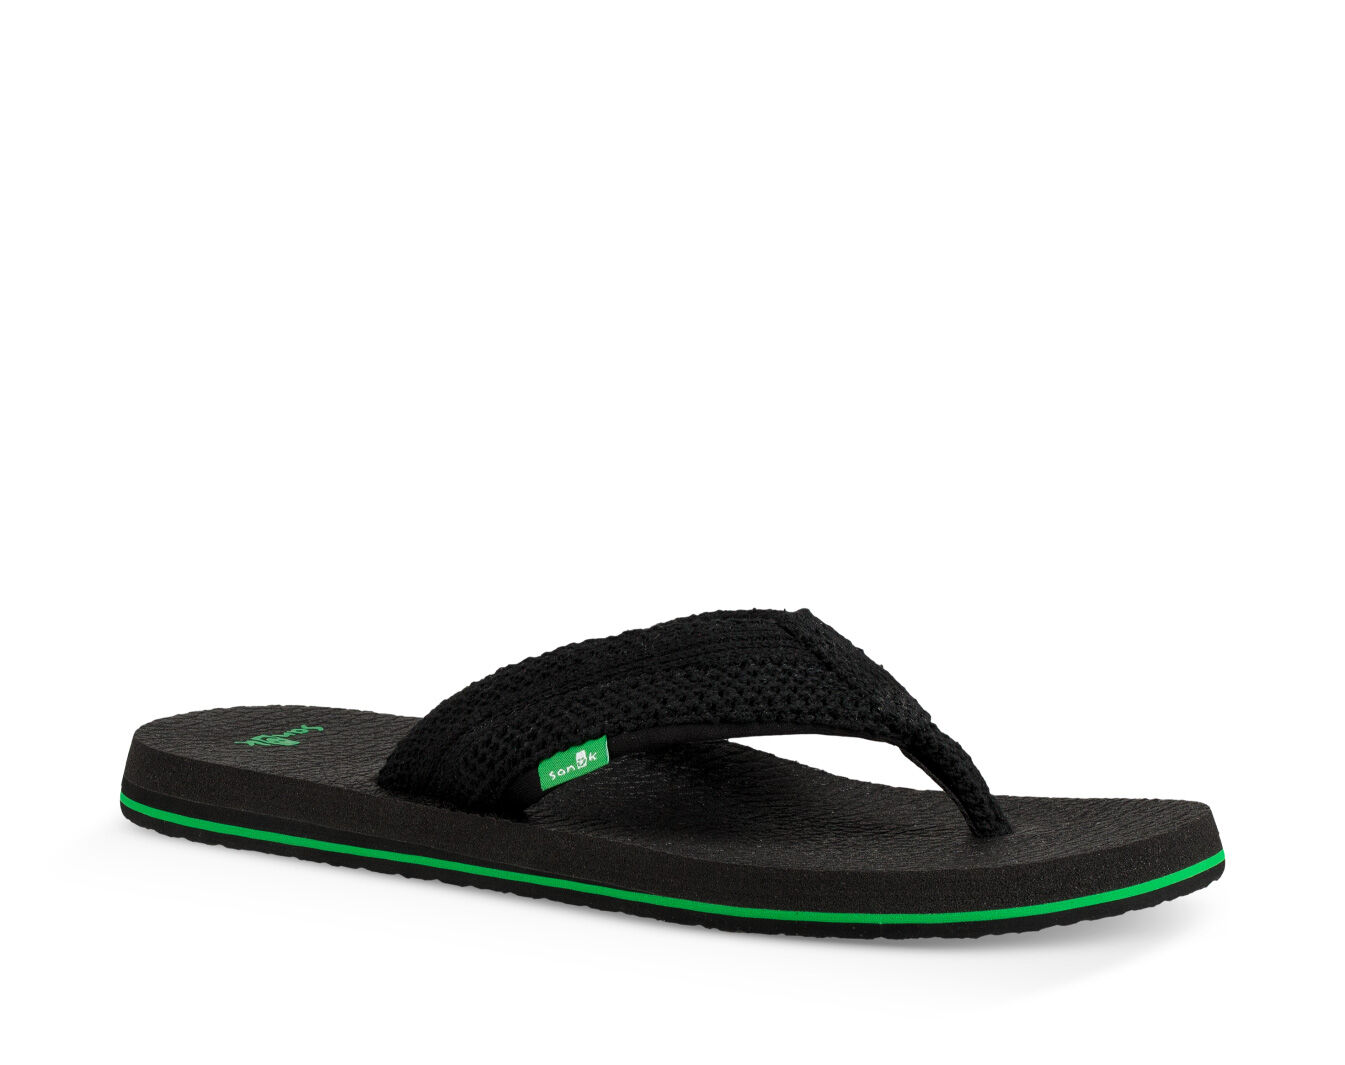 Sanuk M Beer Cozy Flip Flops  Black  4GF3C3949